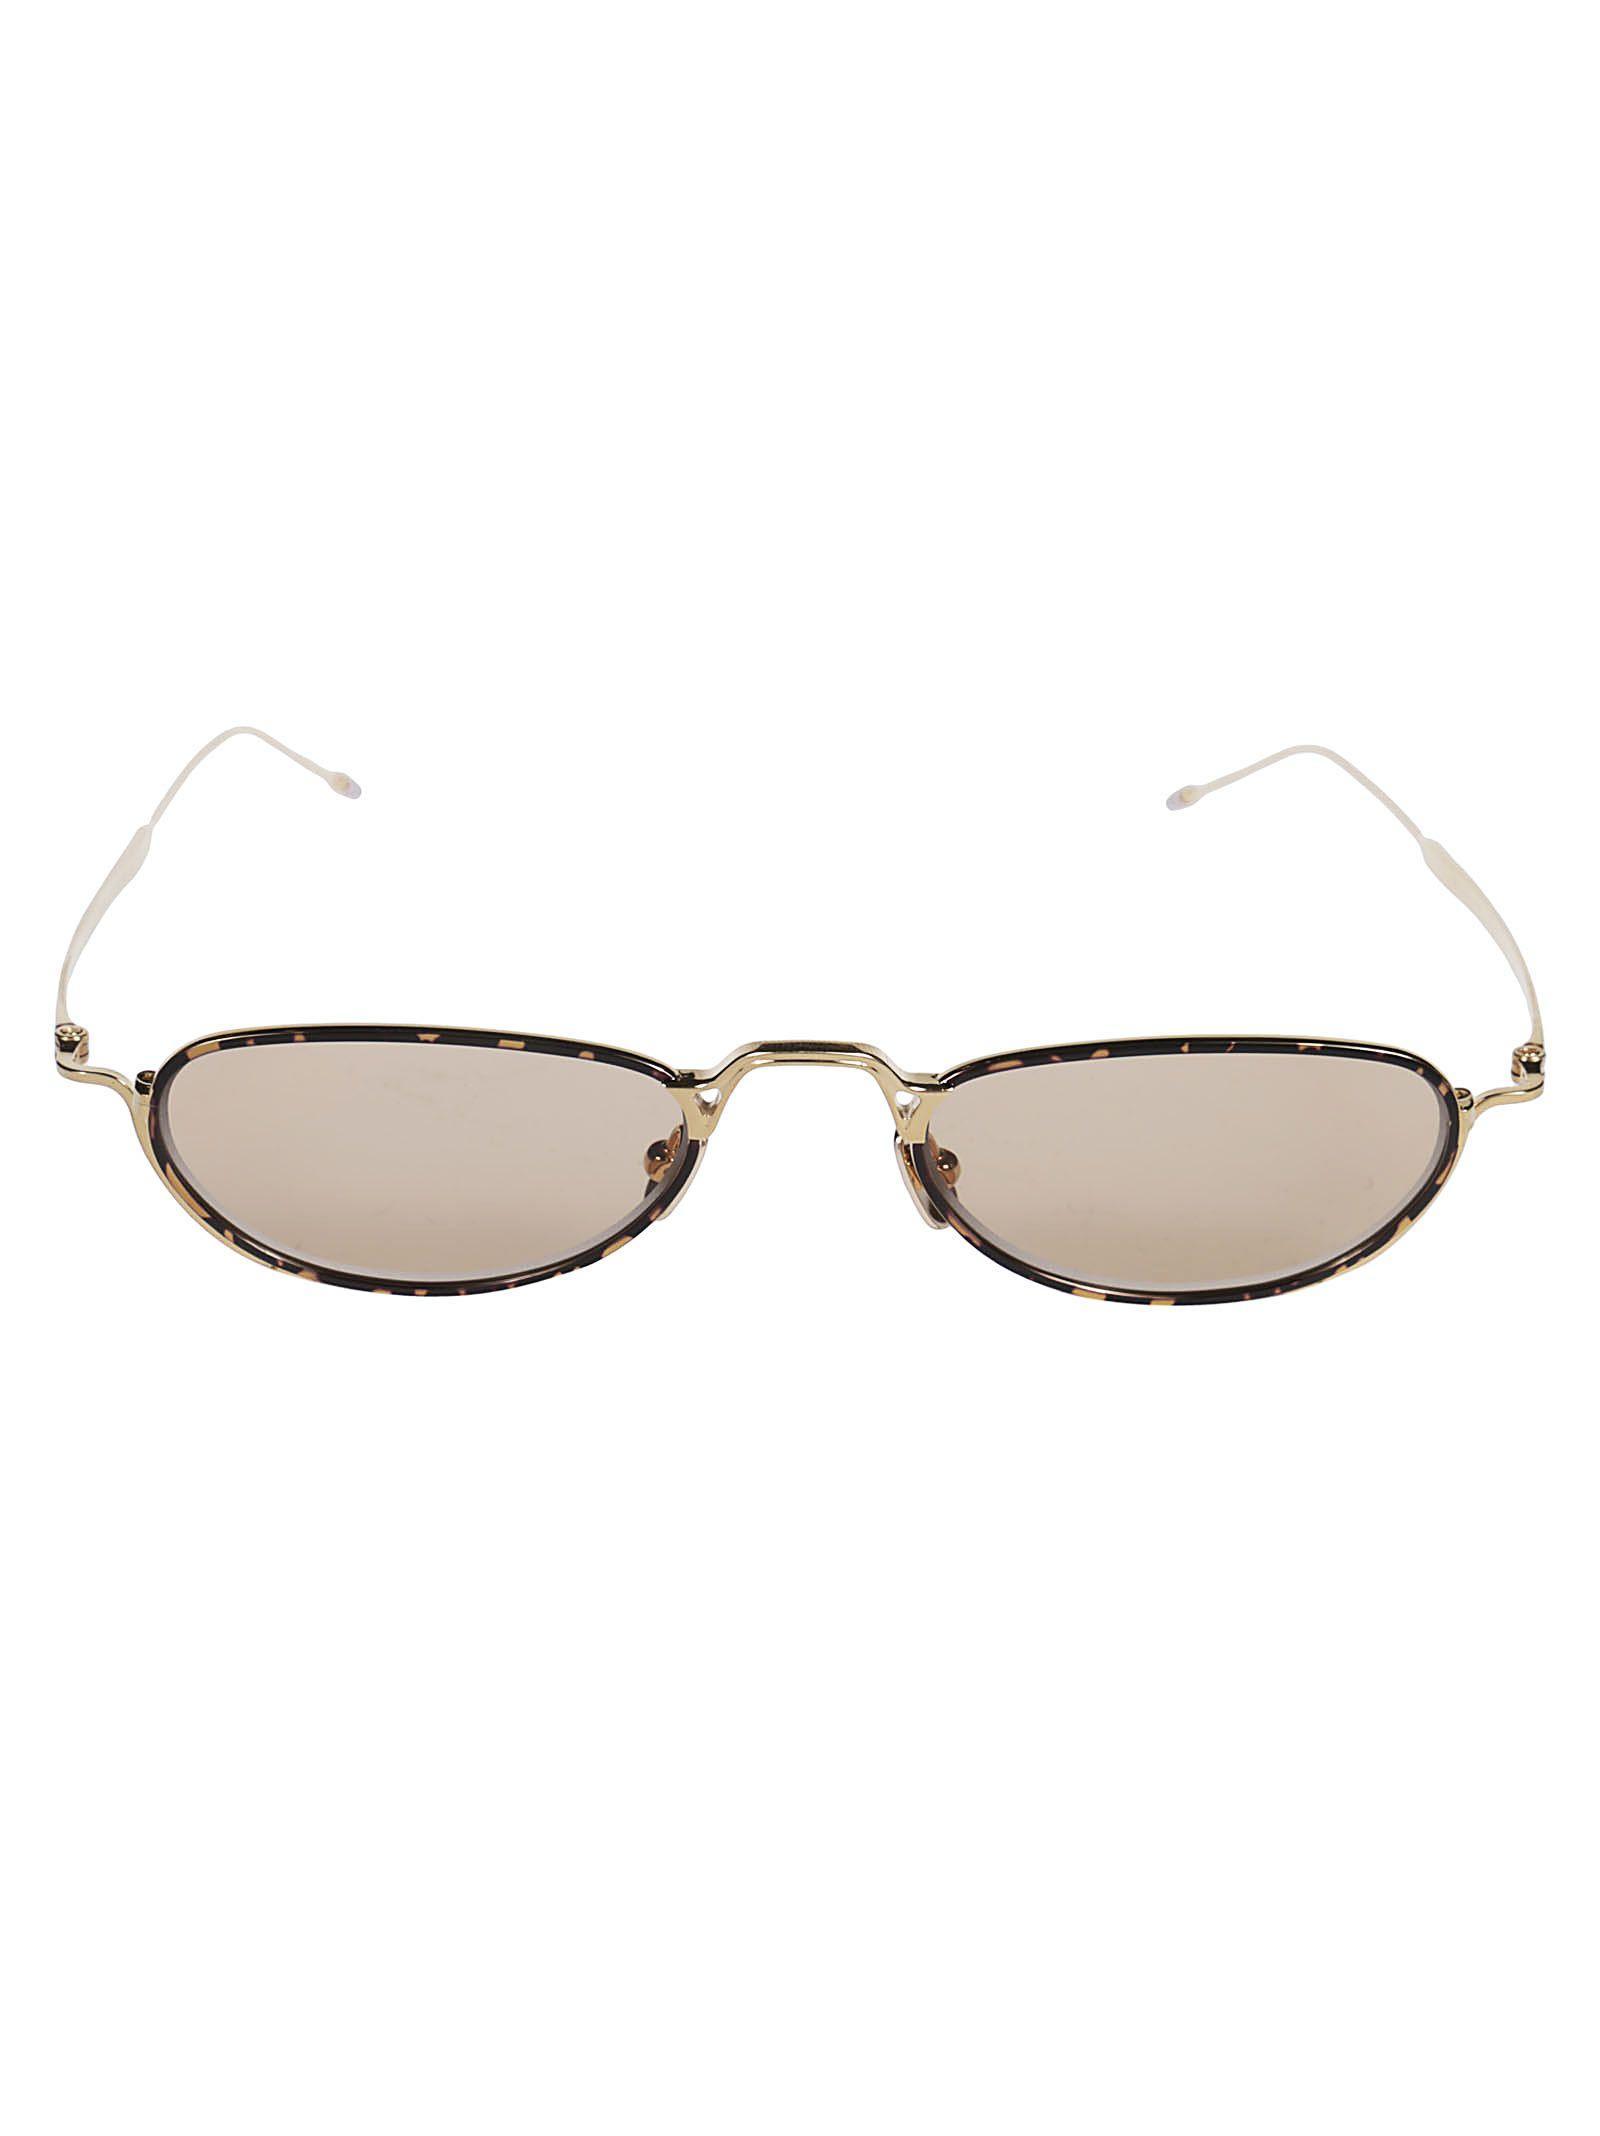 7fbfd7db04 Thom Browne Small Lenses Frame Sunglasses In White Gold Tortoise ...